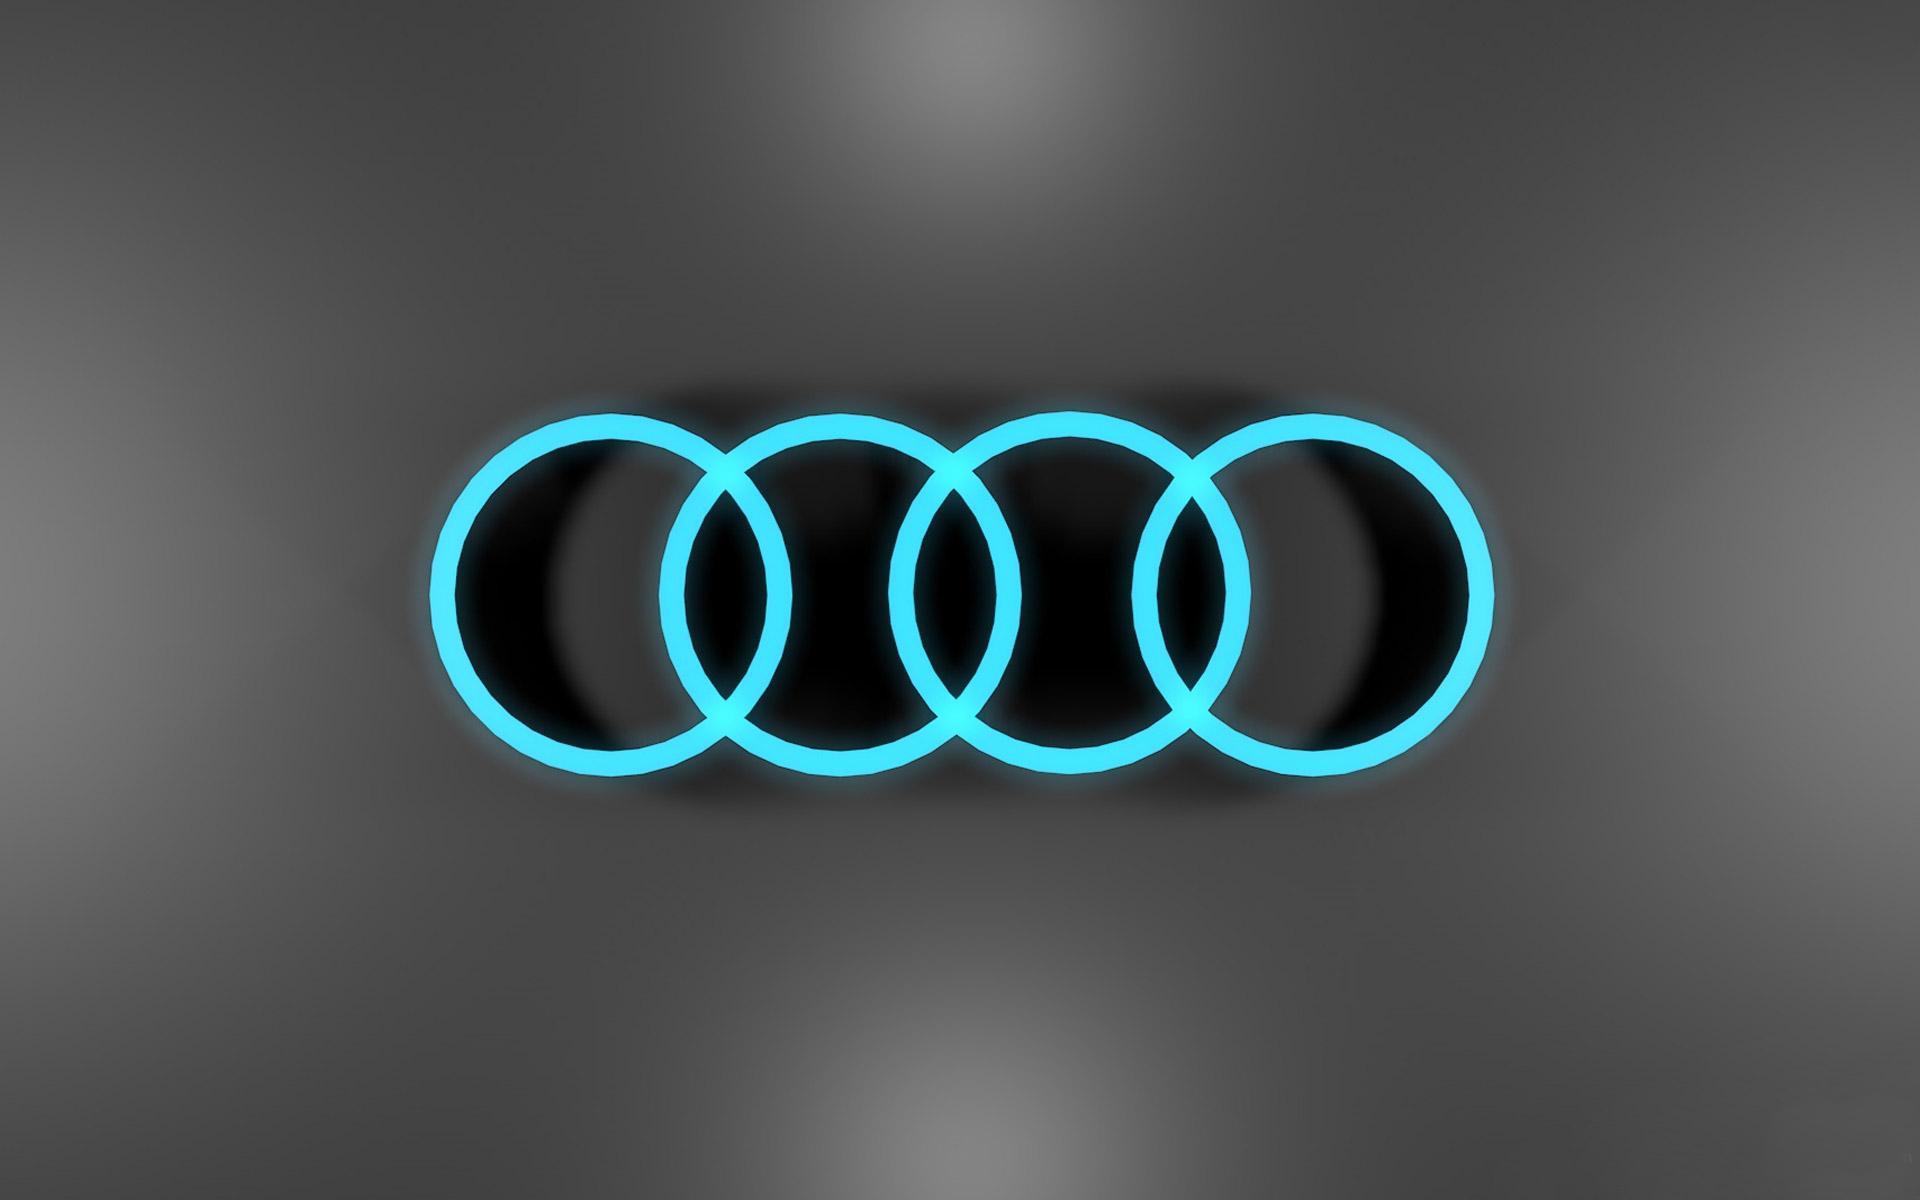 Audi HD Company Logo Desktop Wallpapers 7733 HD Wallpaper 3D 1920x1200